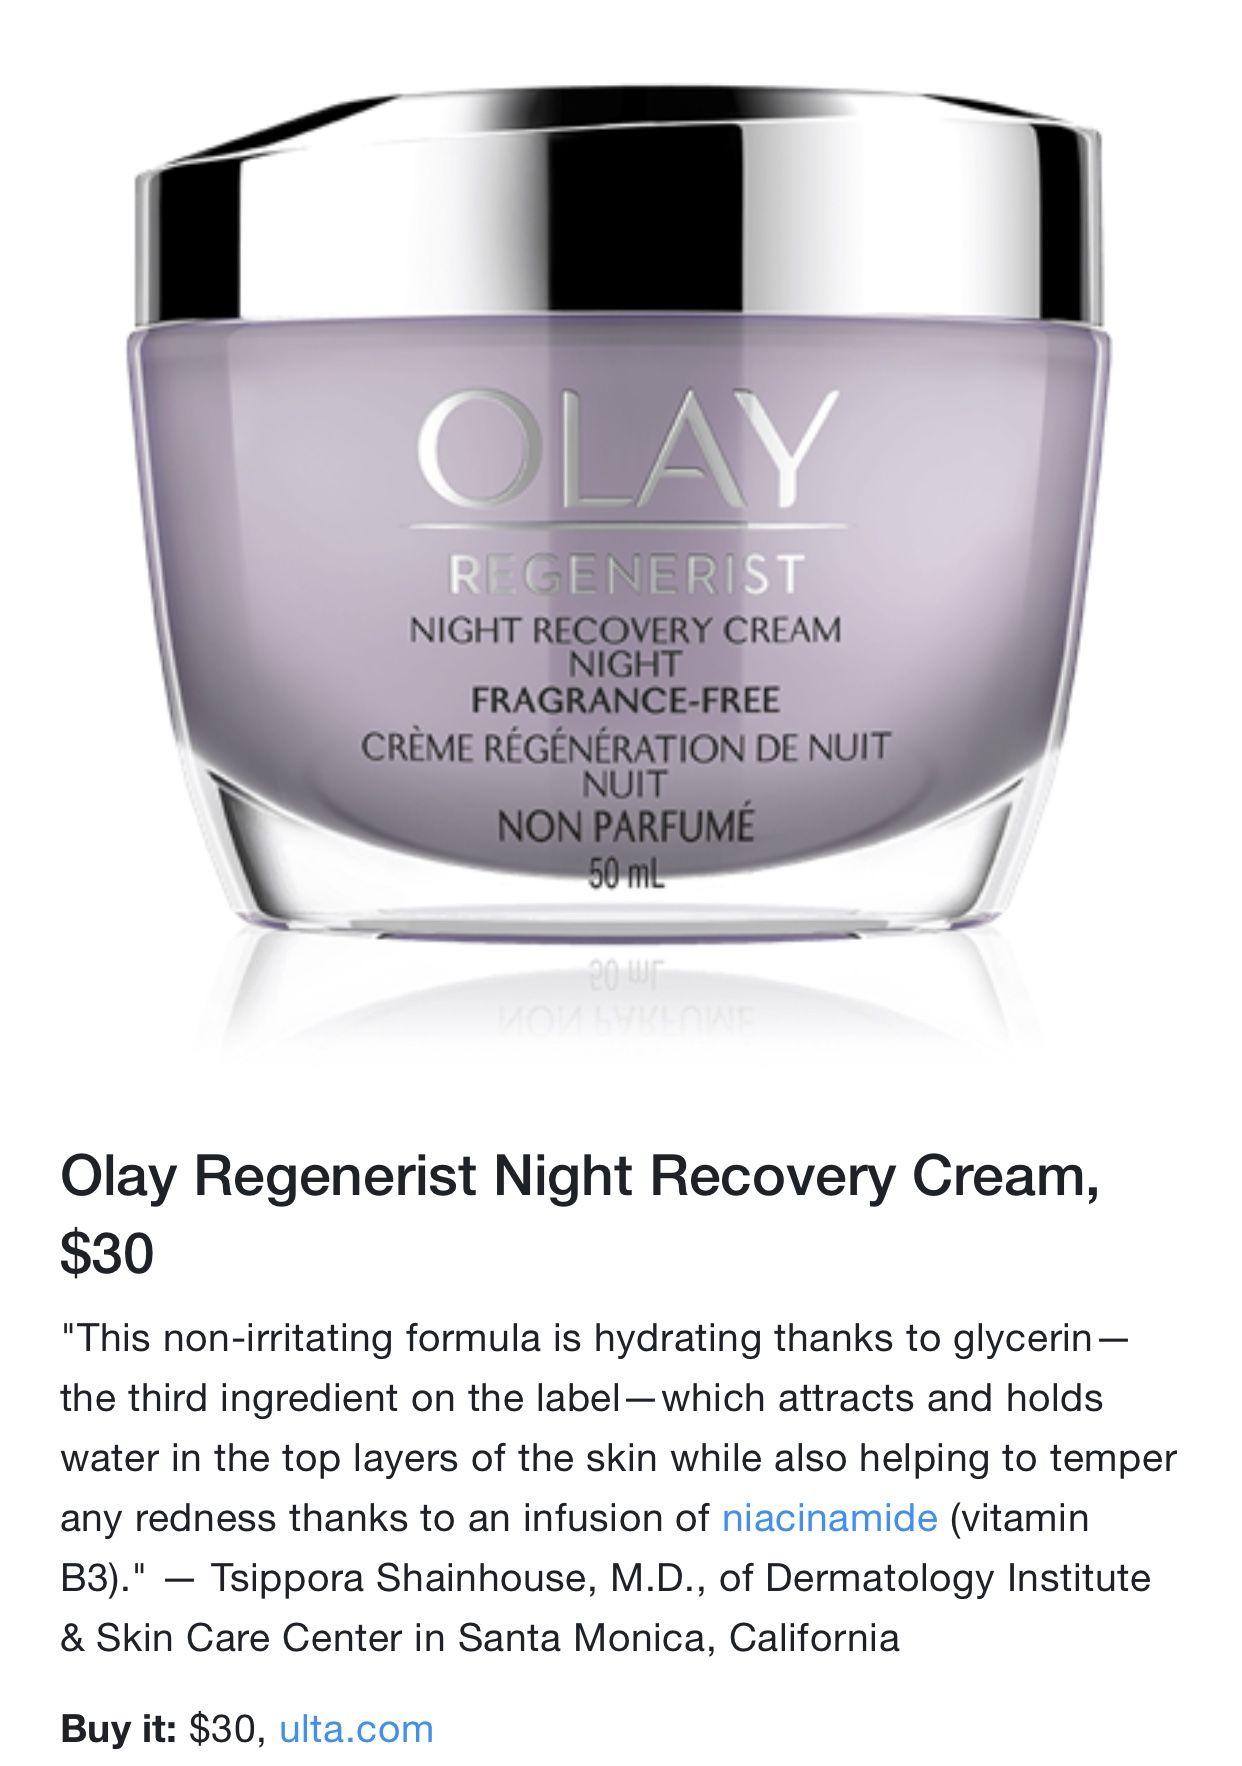 Pin By Briana Ruiz On Skin Beauty Fragrance Free Products Night Creme Olay Regenerist